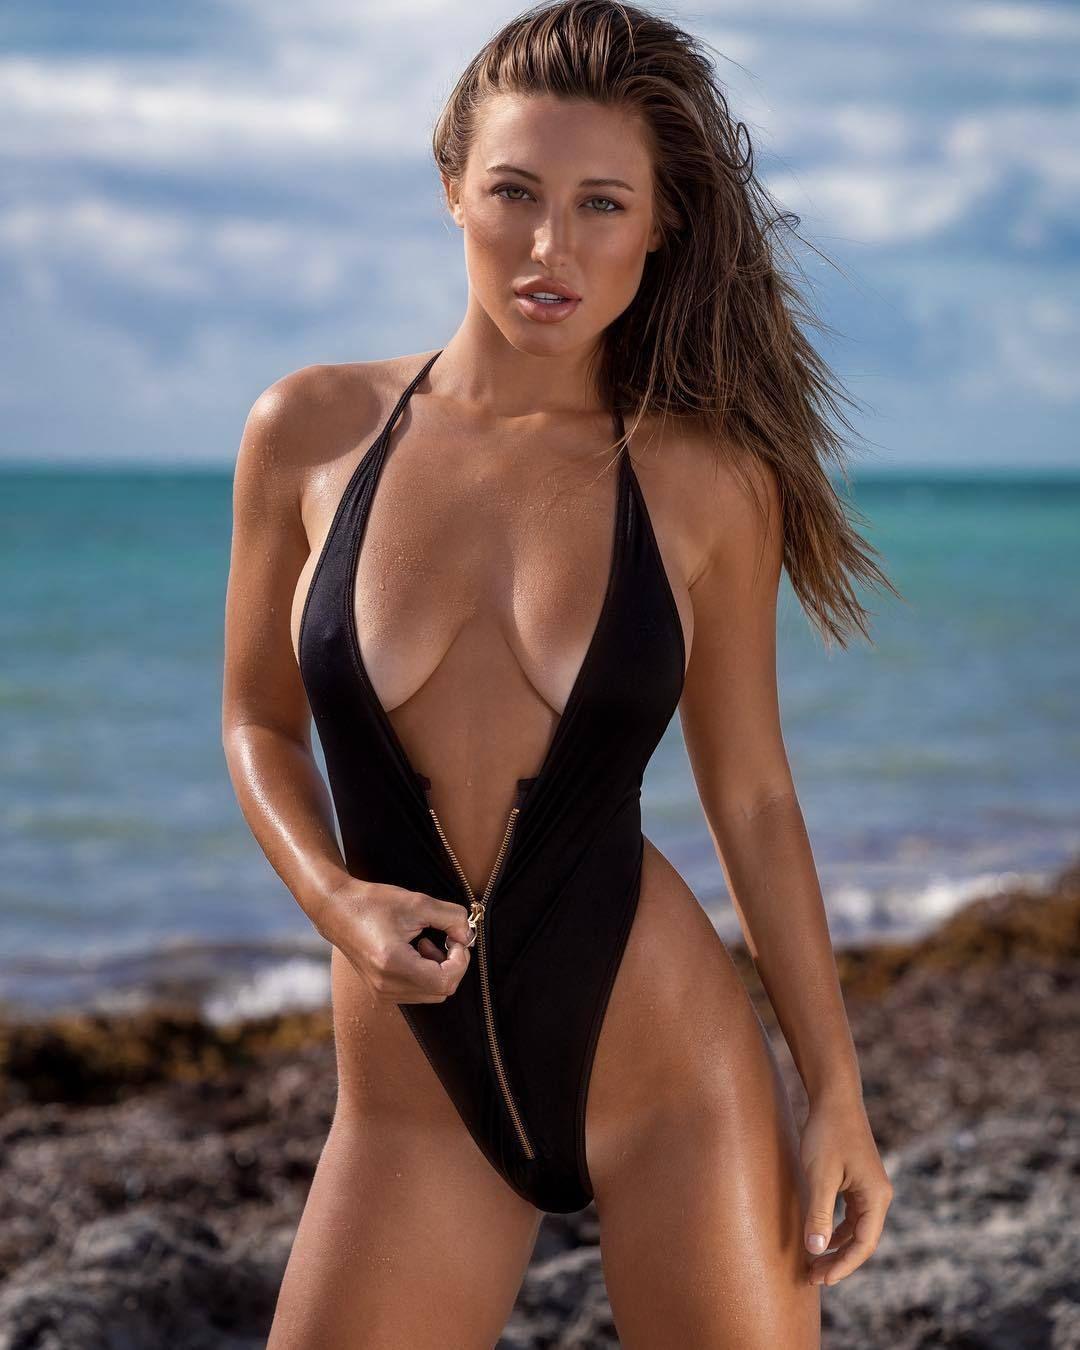 Bikini Stefanie Knight nude (28 pics), Paparazzi